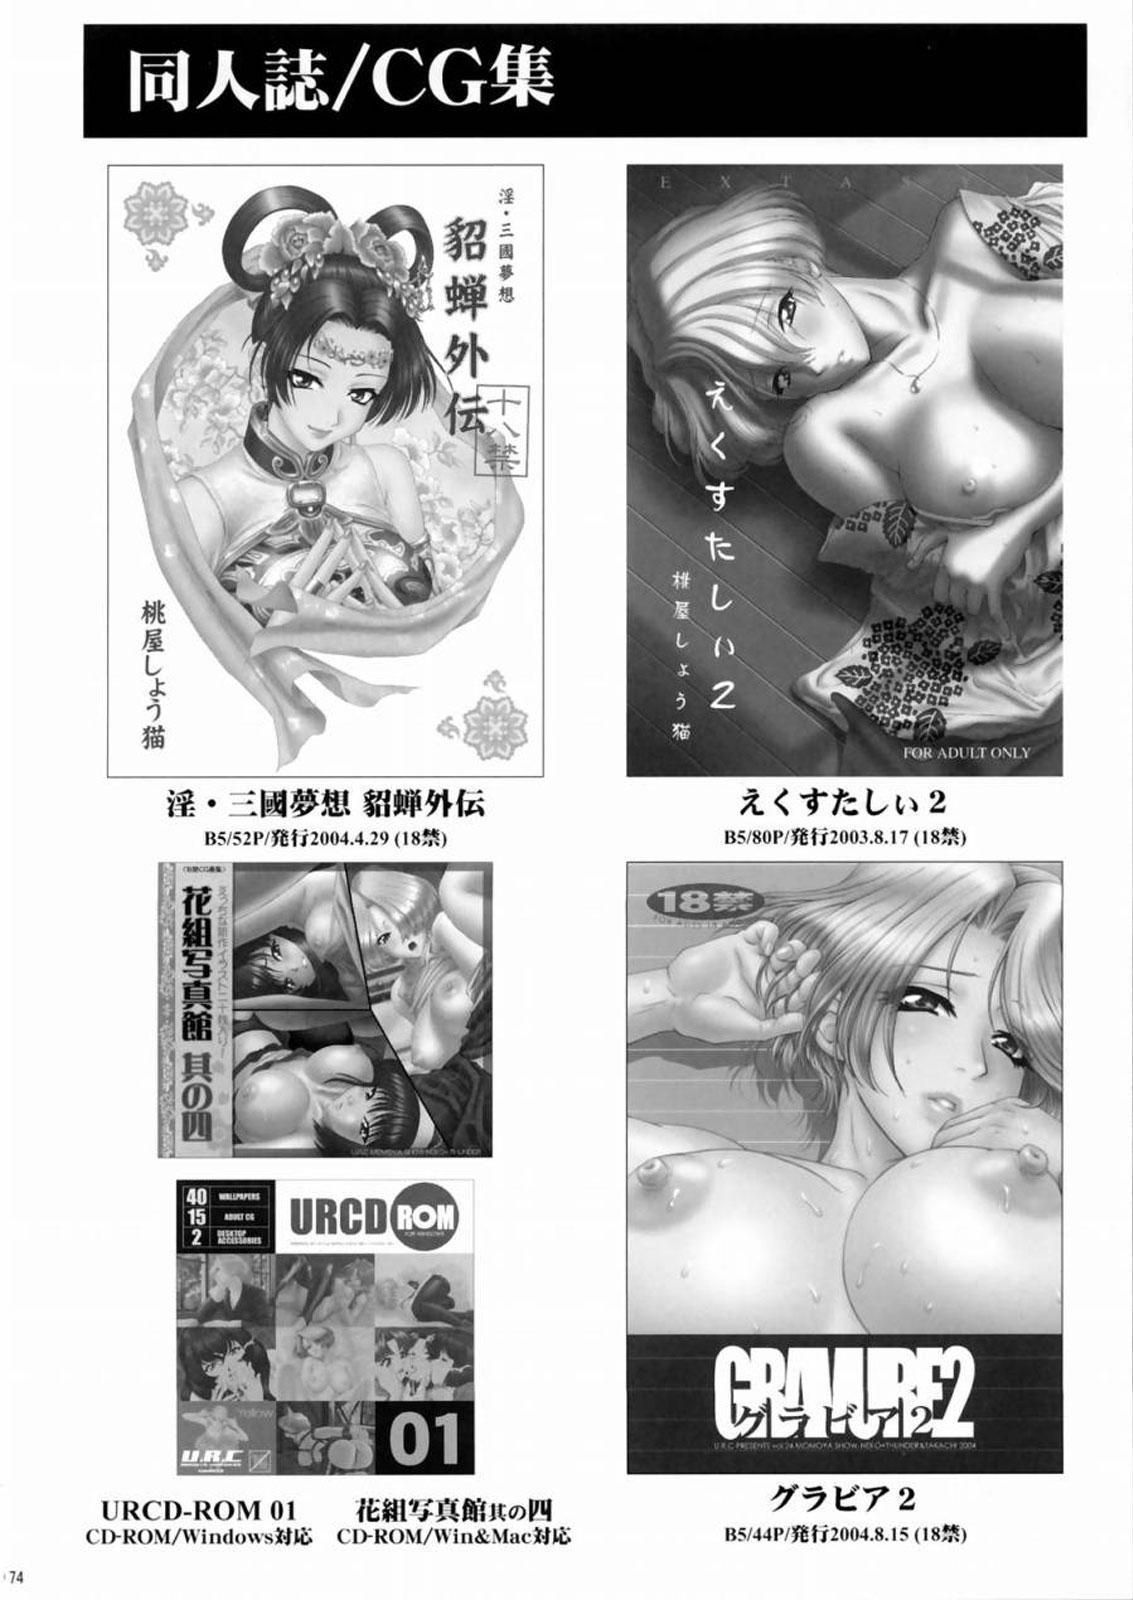 (C66) [U.R.C (Momoya Show-Neko)] Rikuson-chan ~Lovely Gunshi no Himitsu~ | Rikuson-chan Secret of The Lovely Strategist (Dynasty Warriors) [English] [SaHa] 72